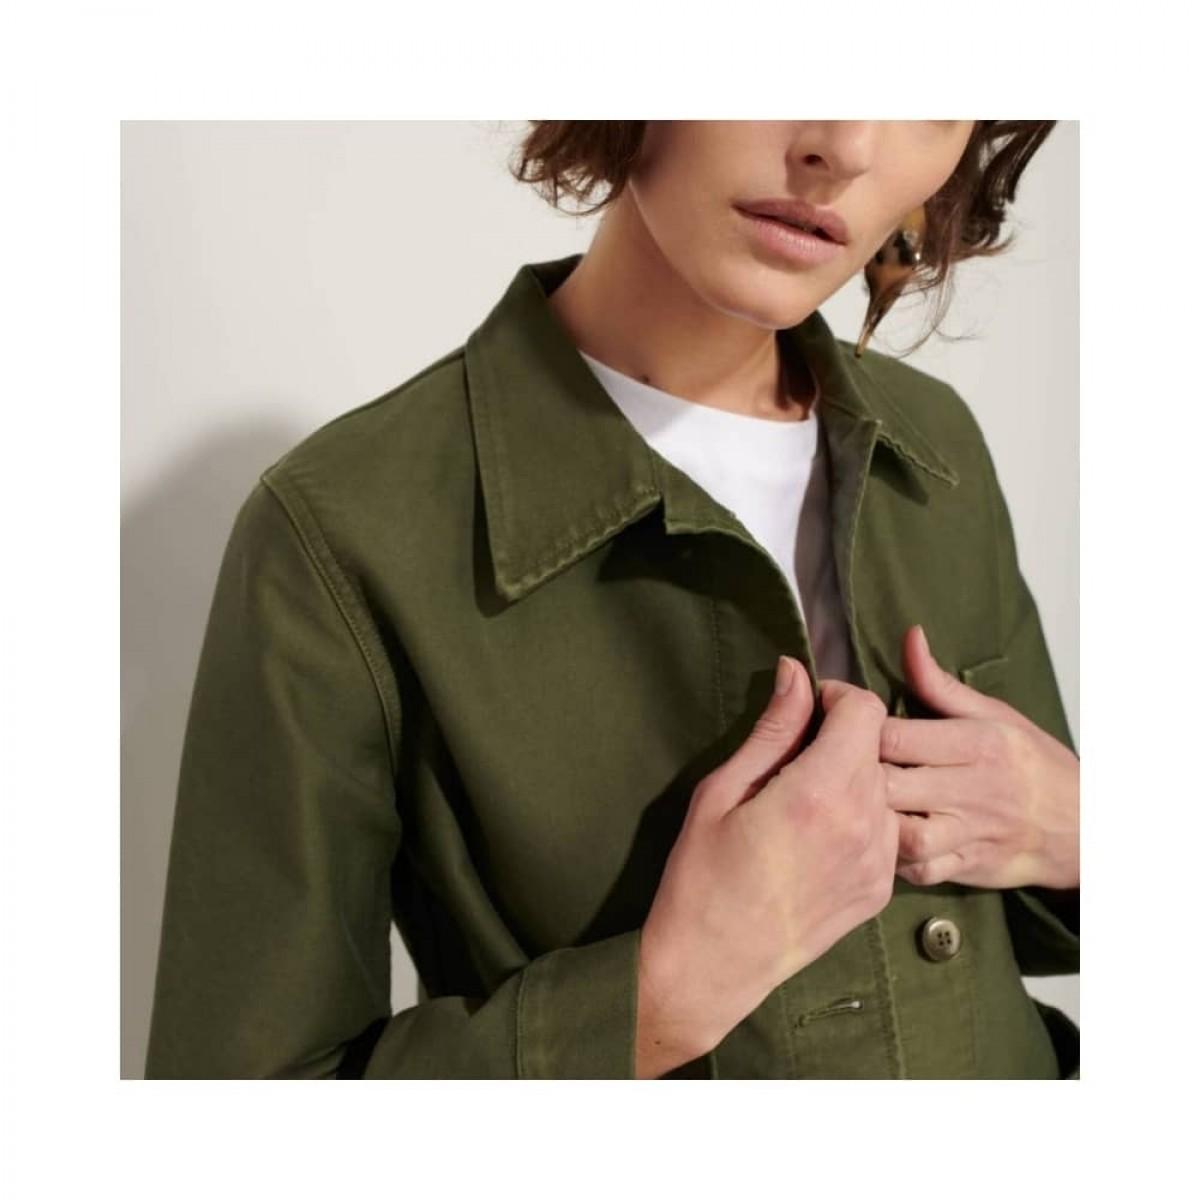 genuine work jacket - kaki - krave detalje